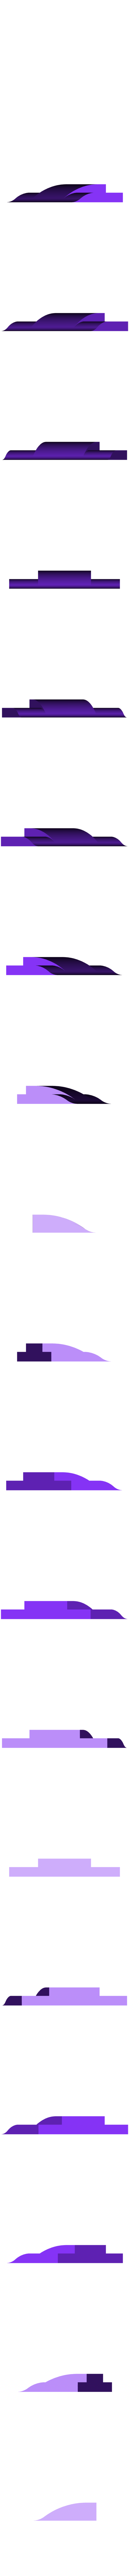 MakerBot_-_Rear_Engine-_SCALED-9b-.STL Download free STL file 4-8-8-4 Big Boy Locomotive • 3D printer object, RaymondDeLuca